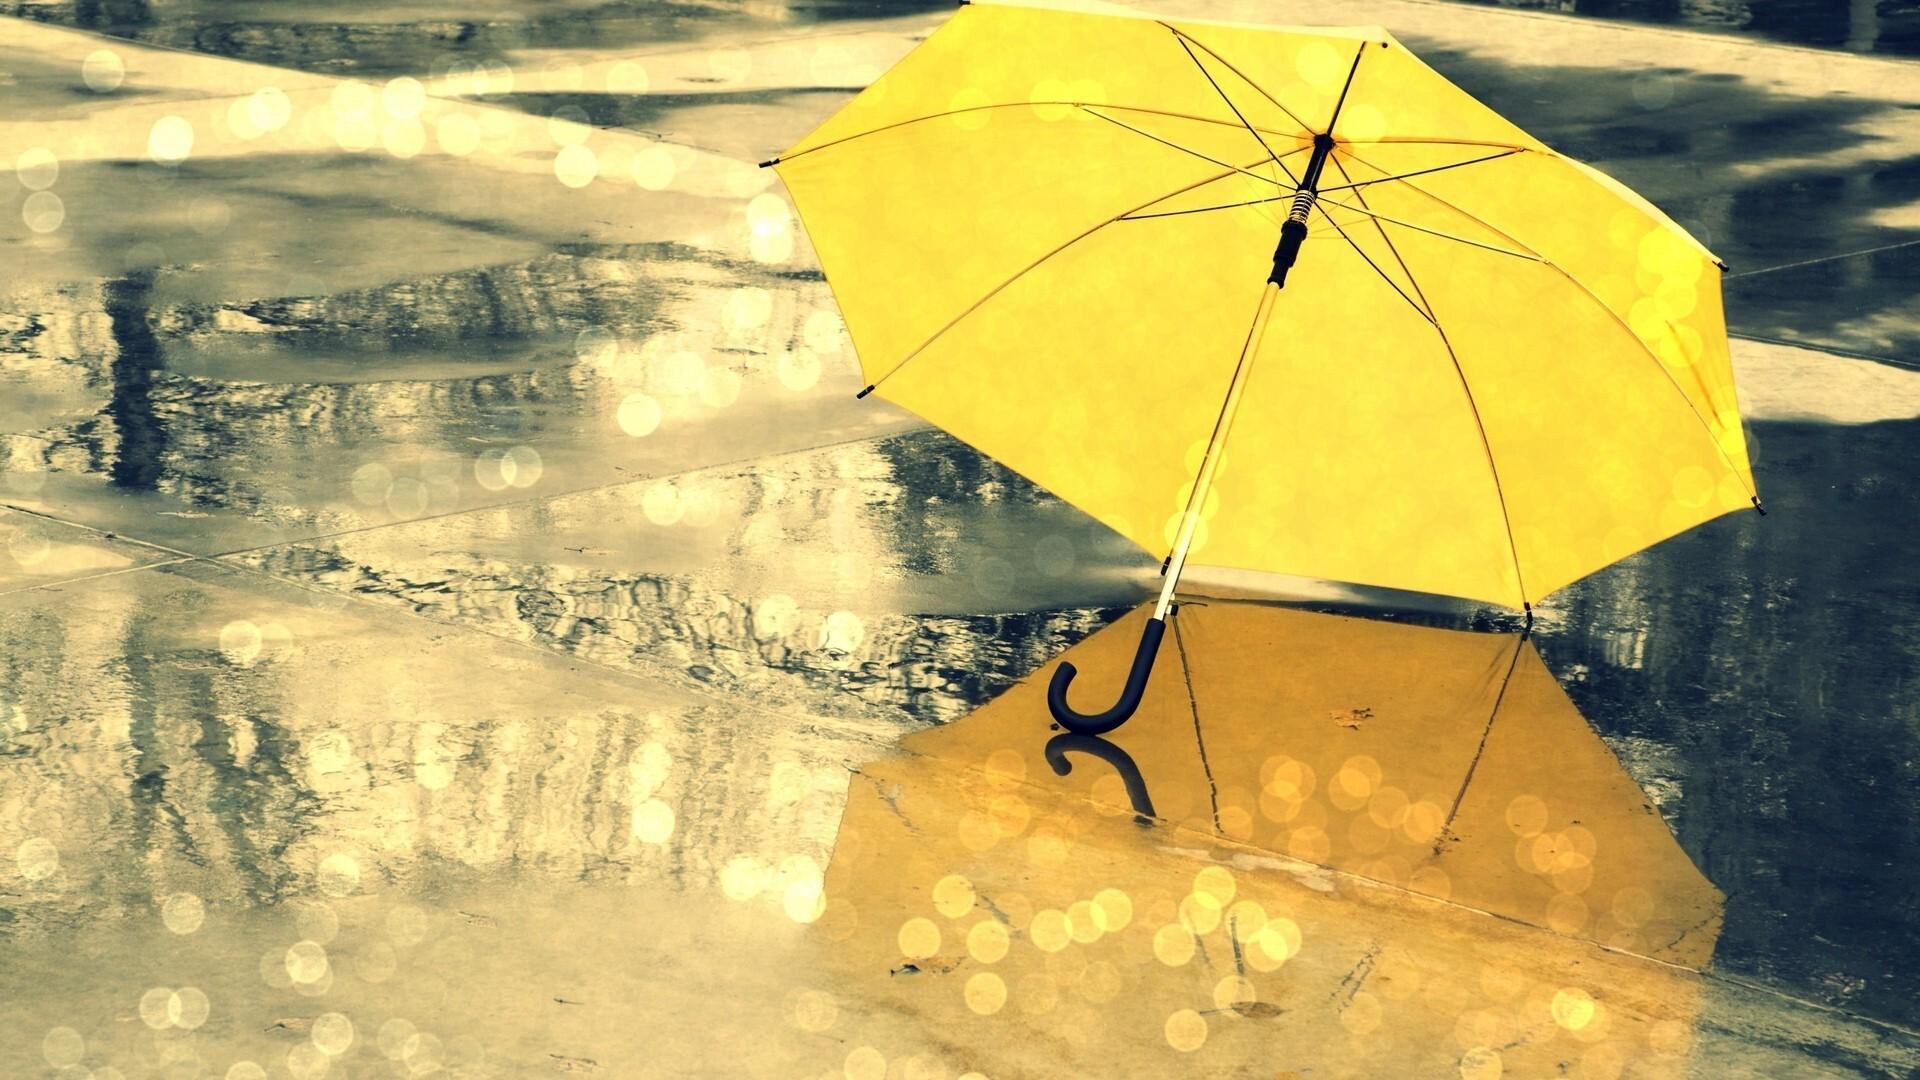 Yellow Umbrella During Rain Season Wallpaper   HD Wallpapers